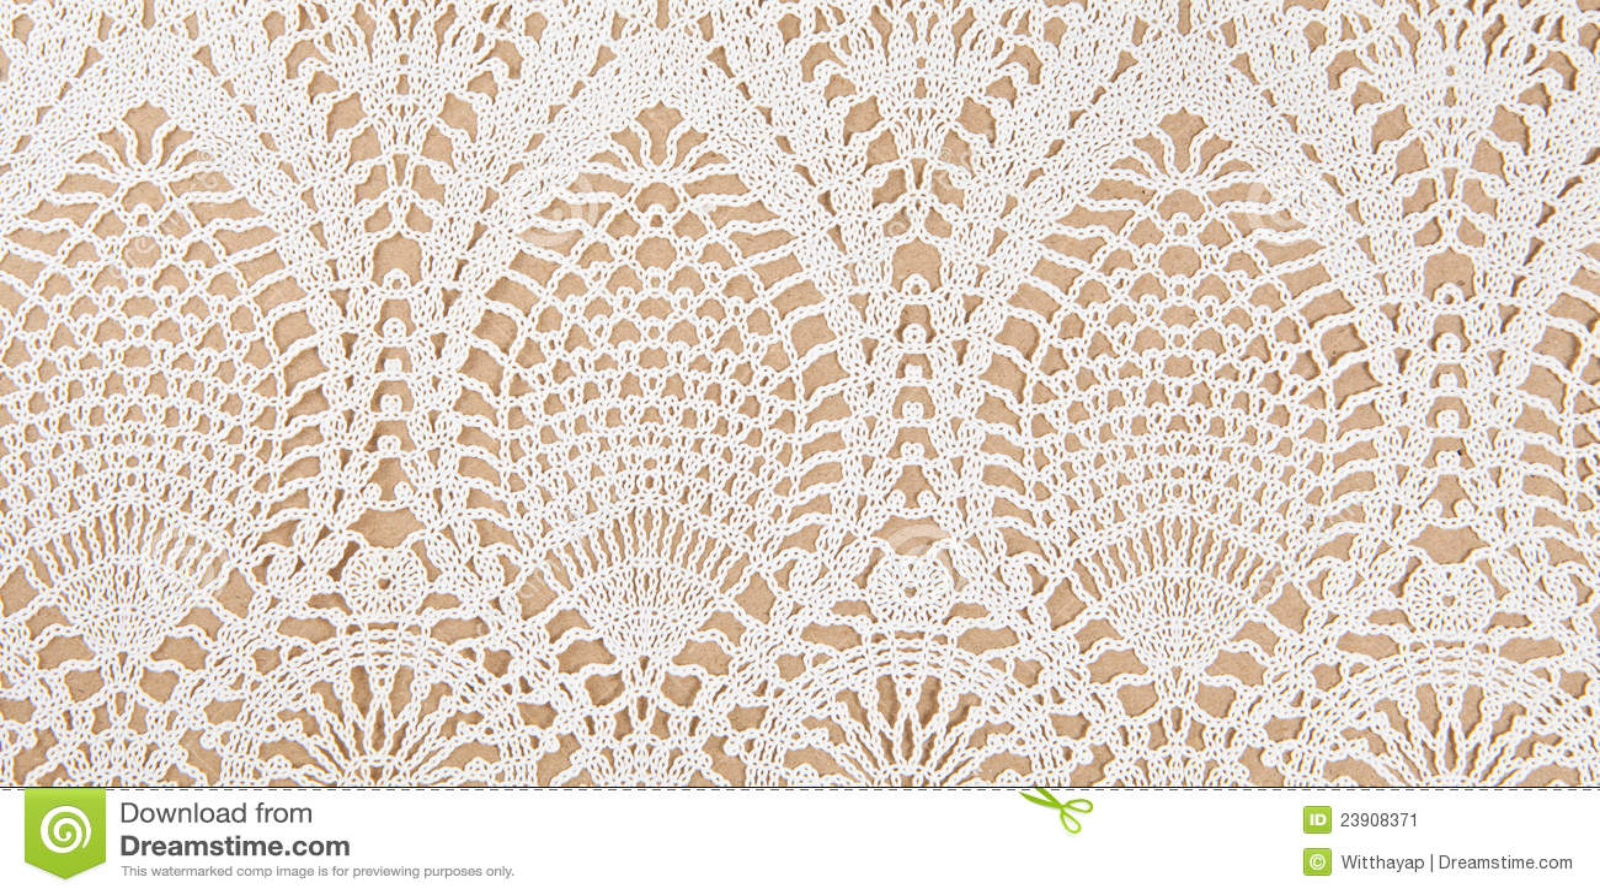 Flower Fabric Texture Stock Image Image 23908371